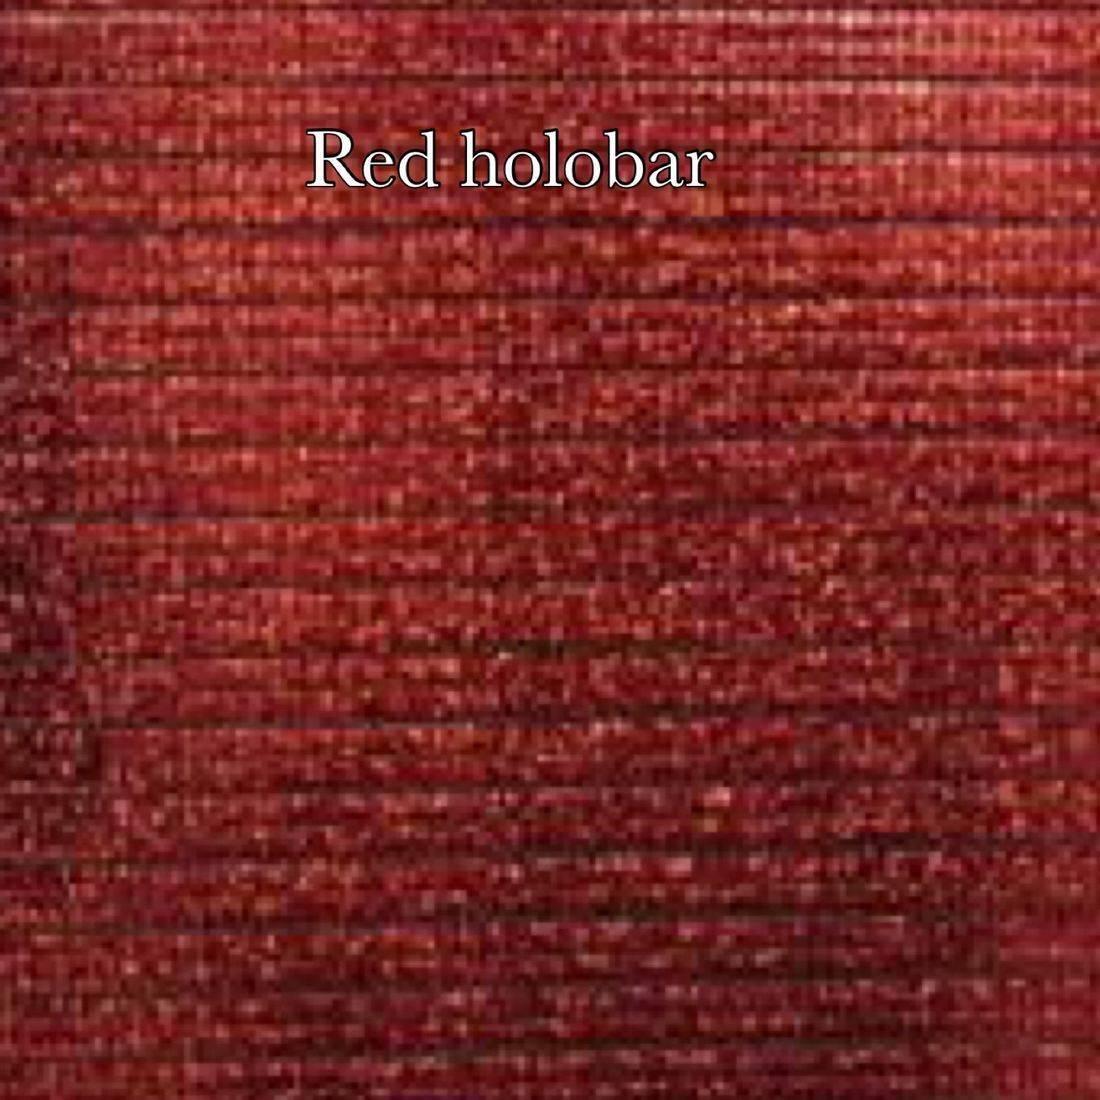 Red holobar